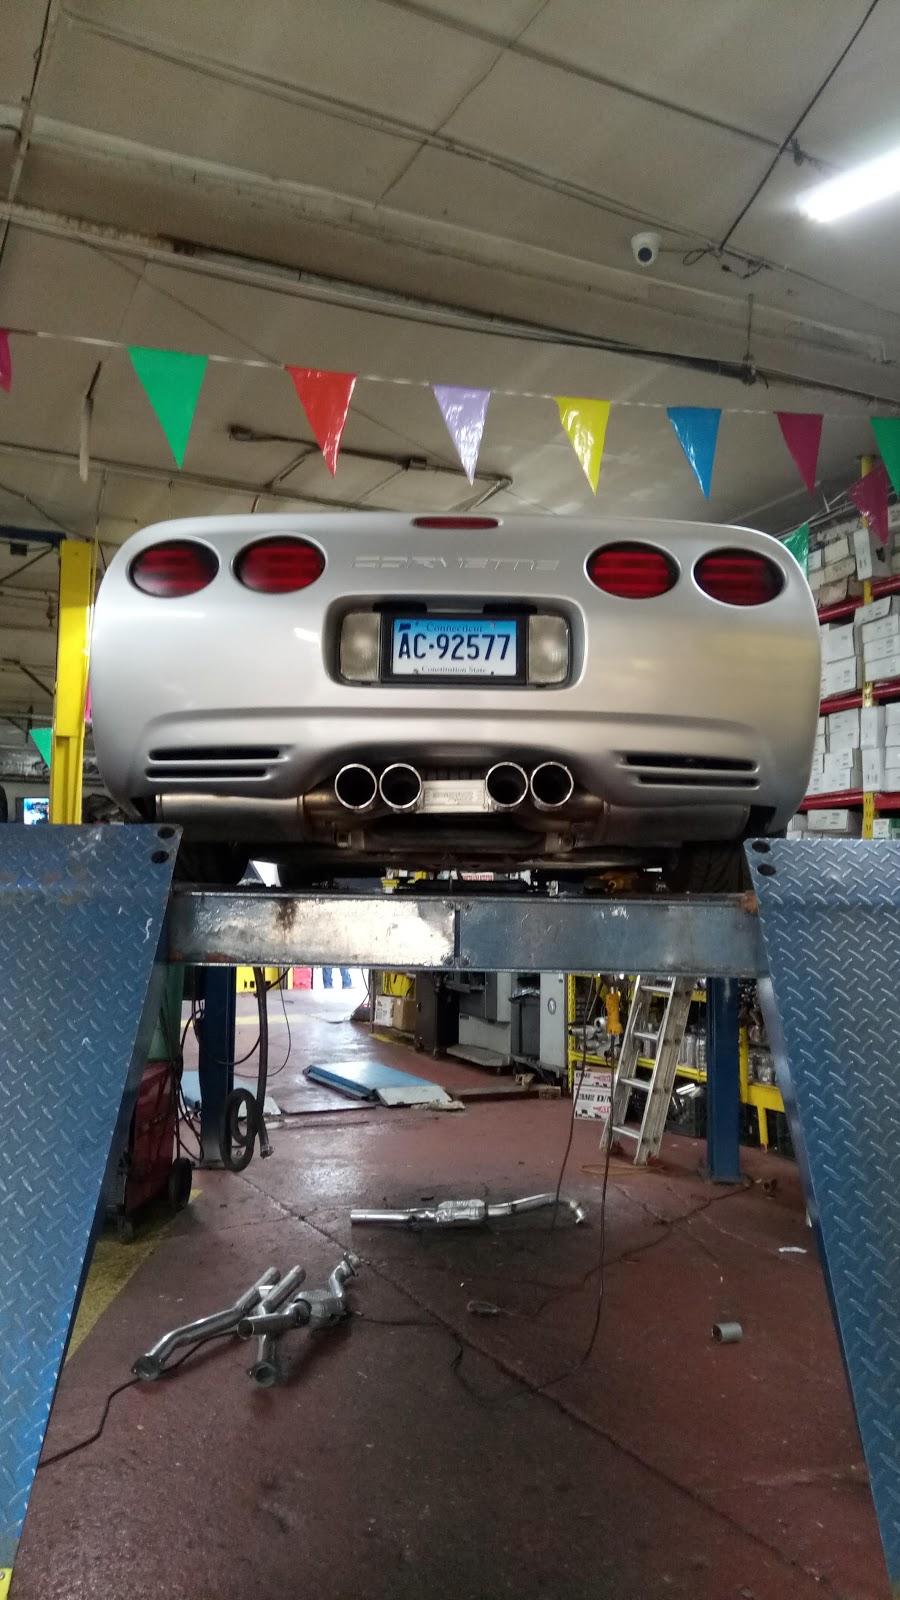 Bronx Discount Muffler Center - car repair    Photo 8 of 10   Address: 501 Bruckner Blvd, Bronx, NY 10455, USA   Phone: (718) 402-4422